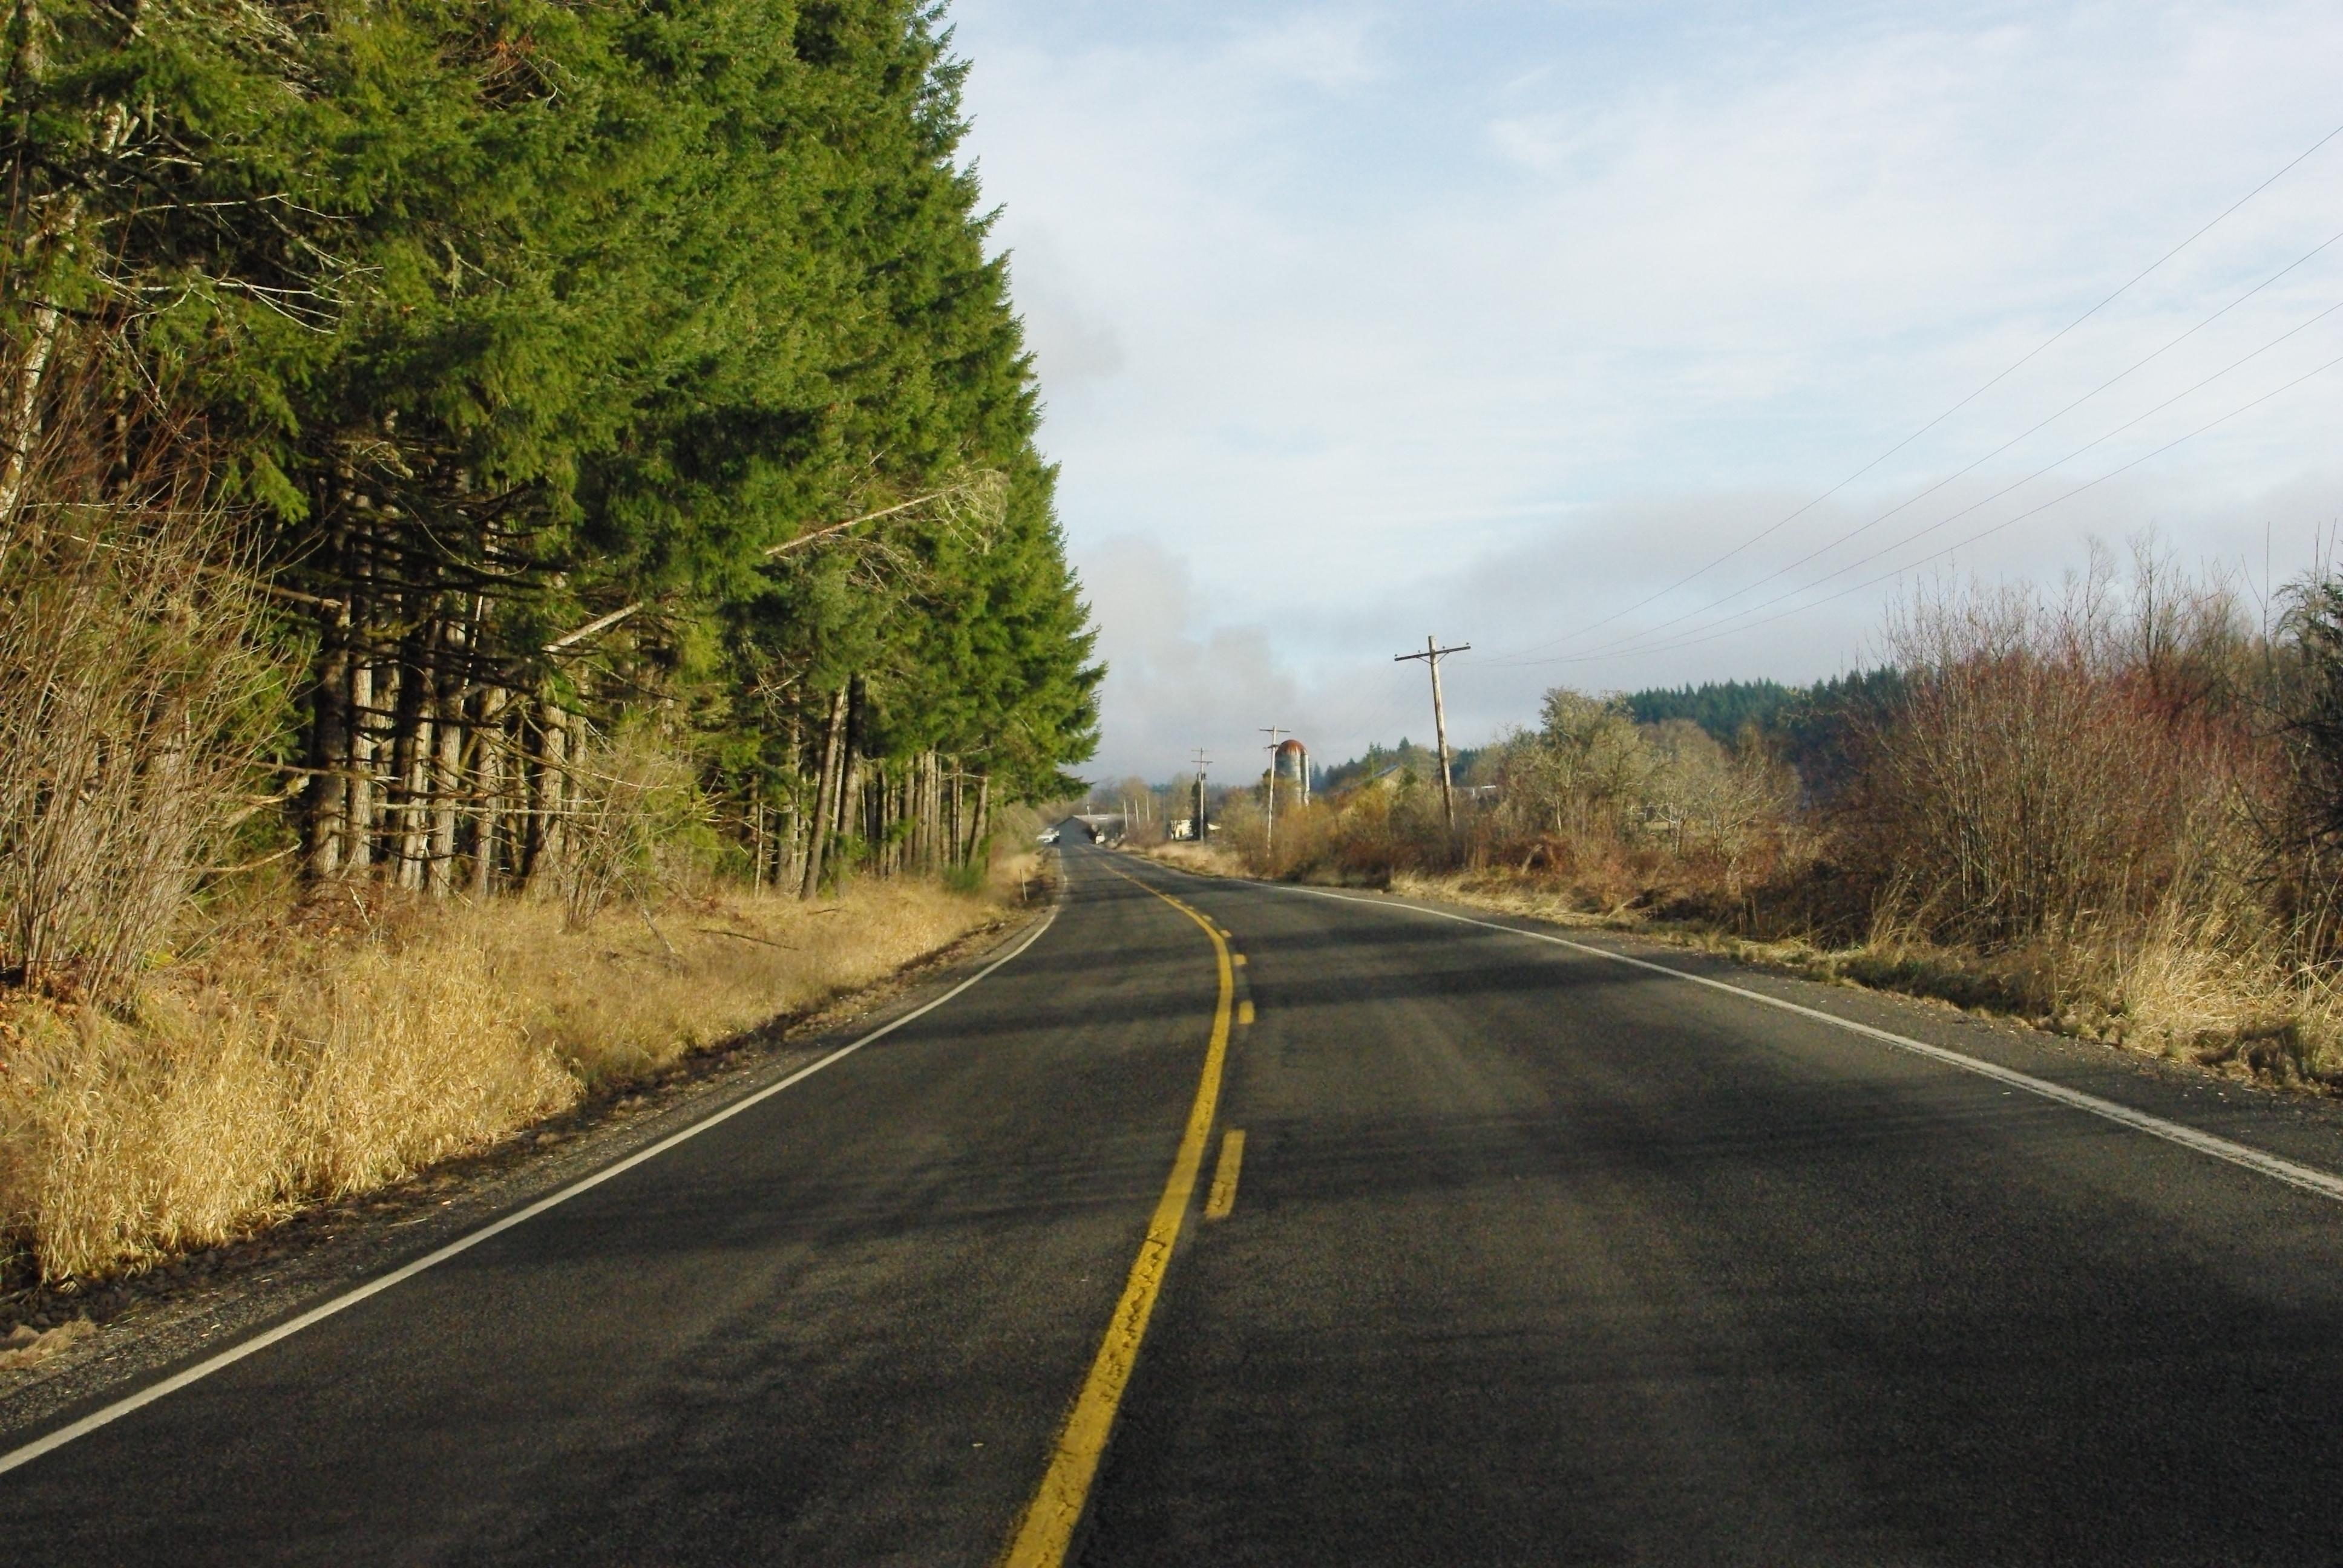 Oregon 202